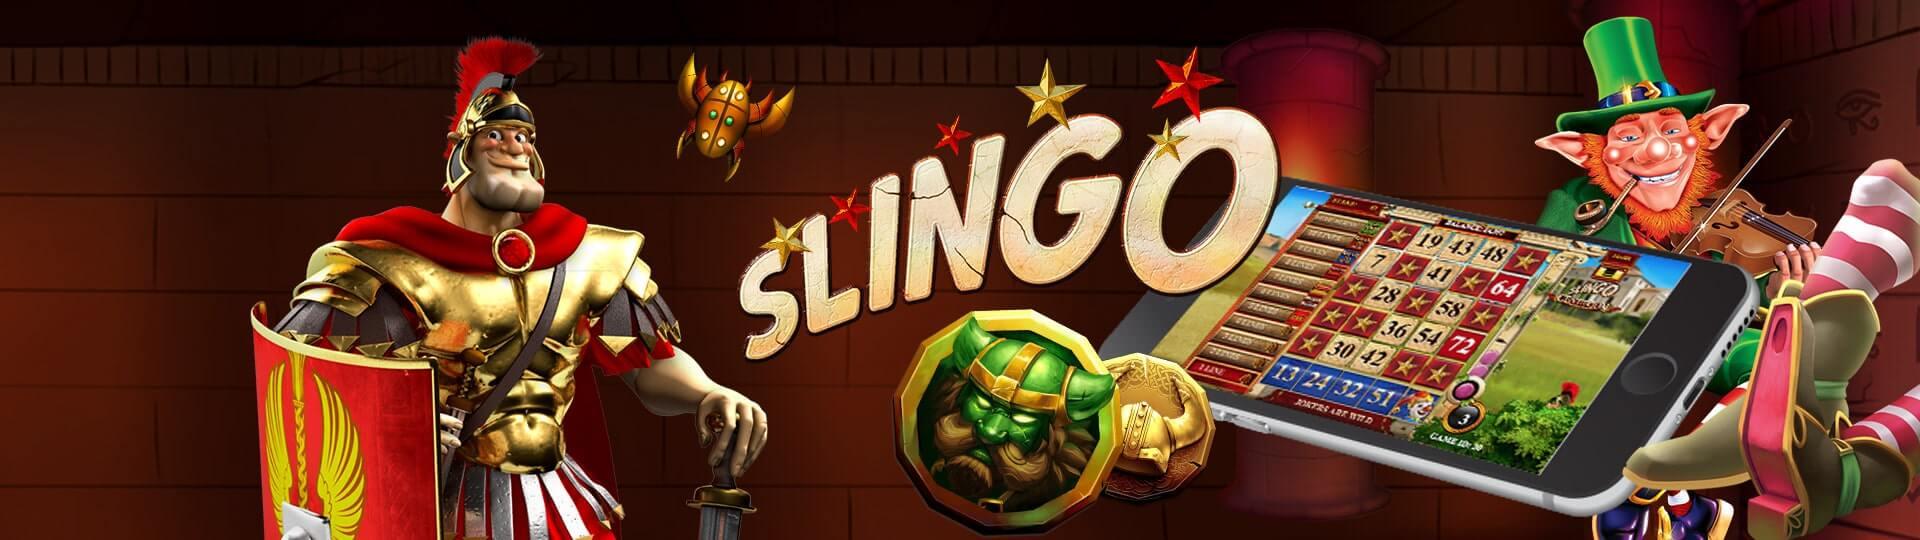 Slingo Gaming Realms CS